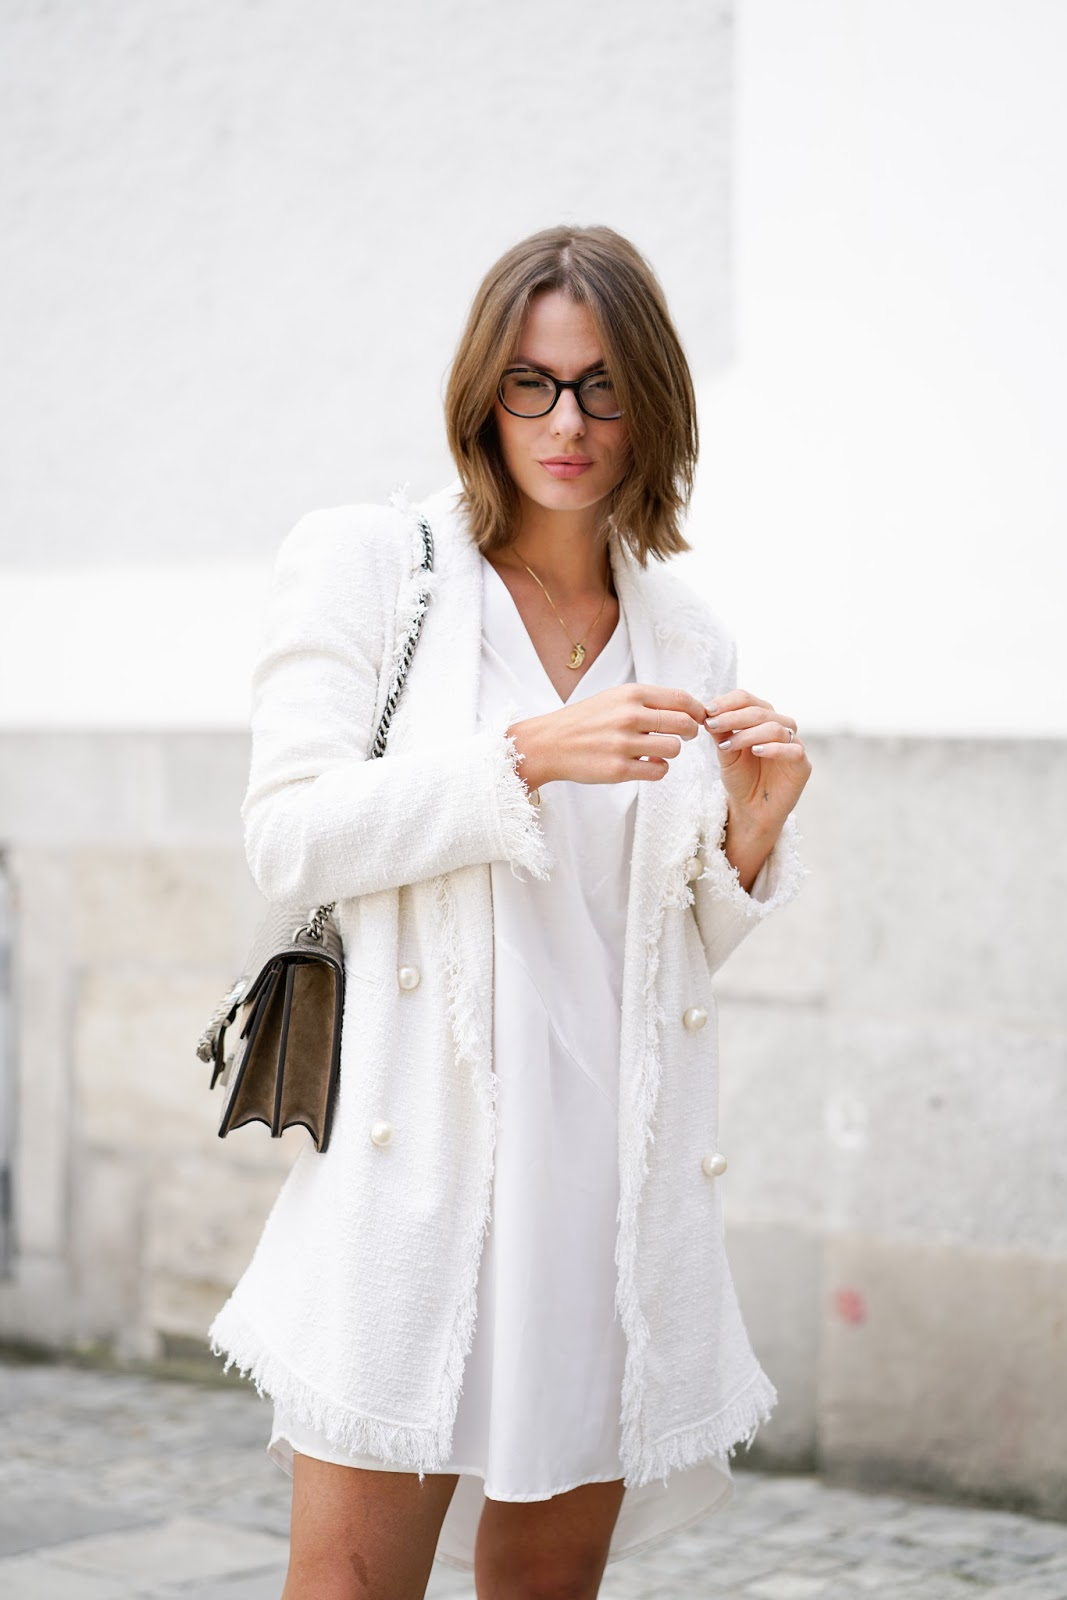 a4c805a2 BOUCLE BLAZER // WEARING – boucle blazer: zara // tunic dress: zara // bow  slippers: edited // bag: gucci dionysus